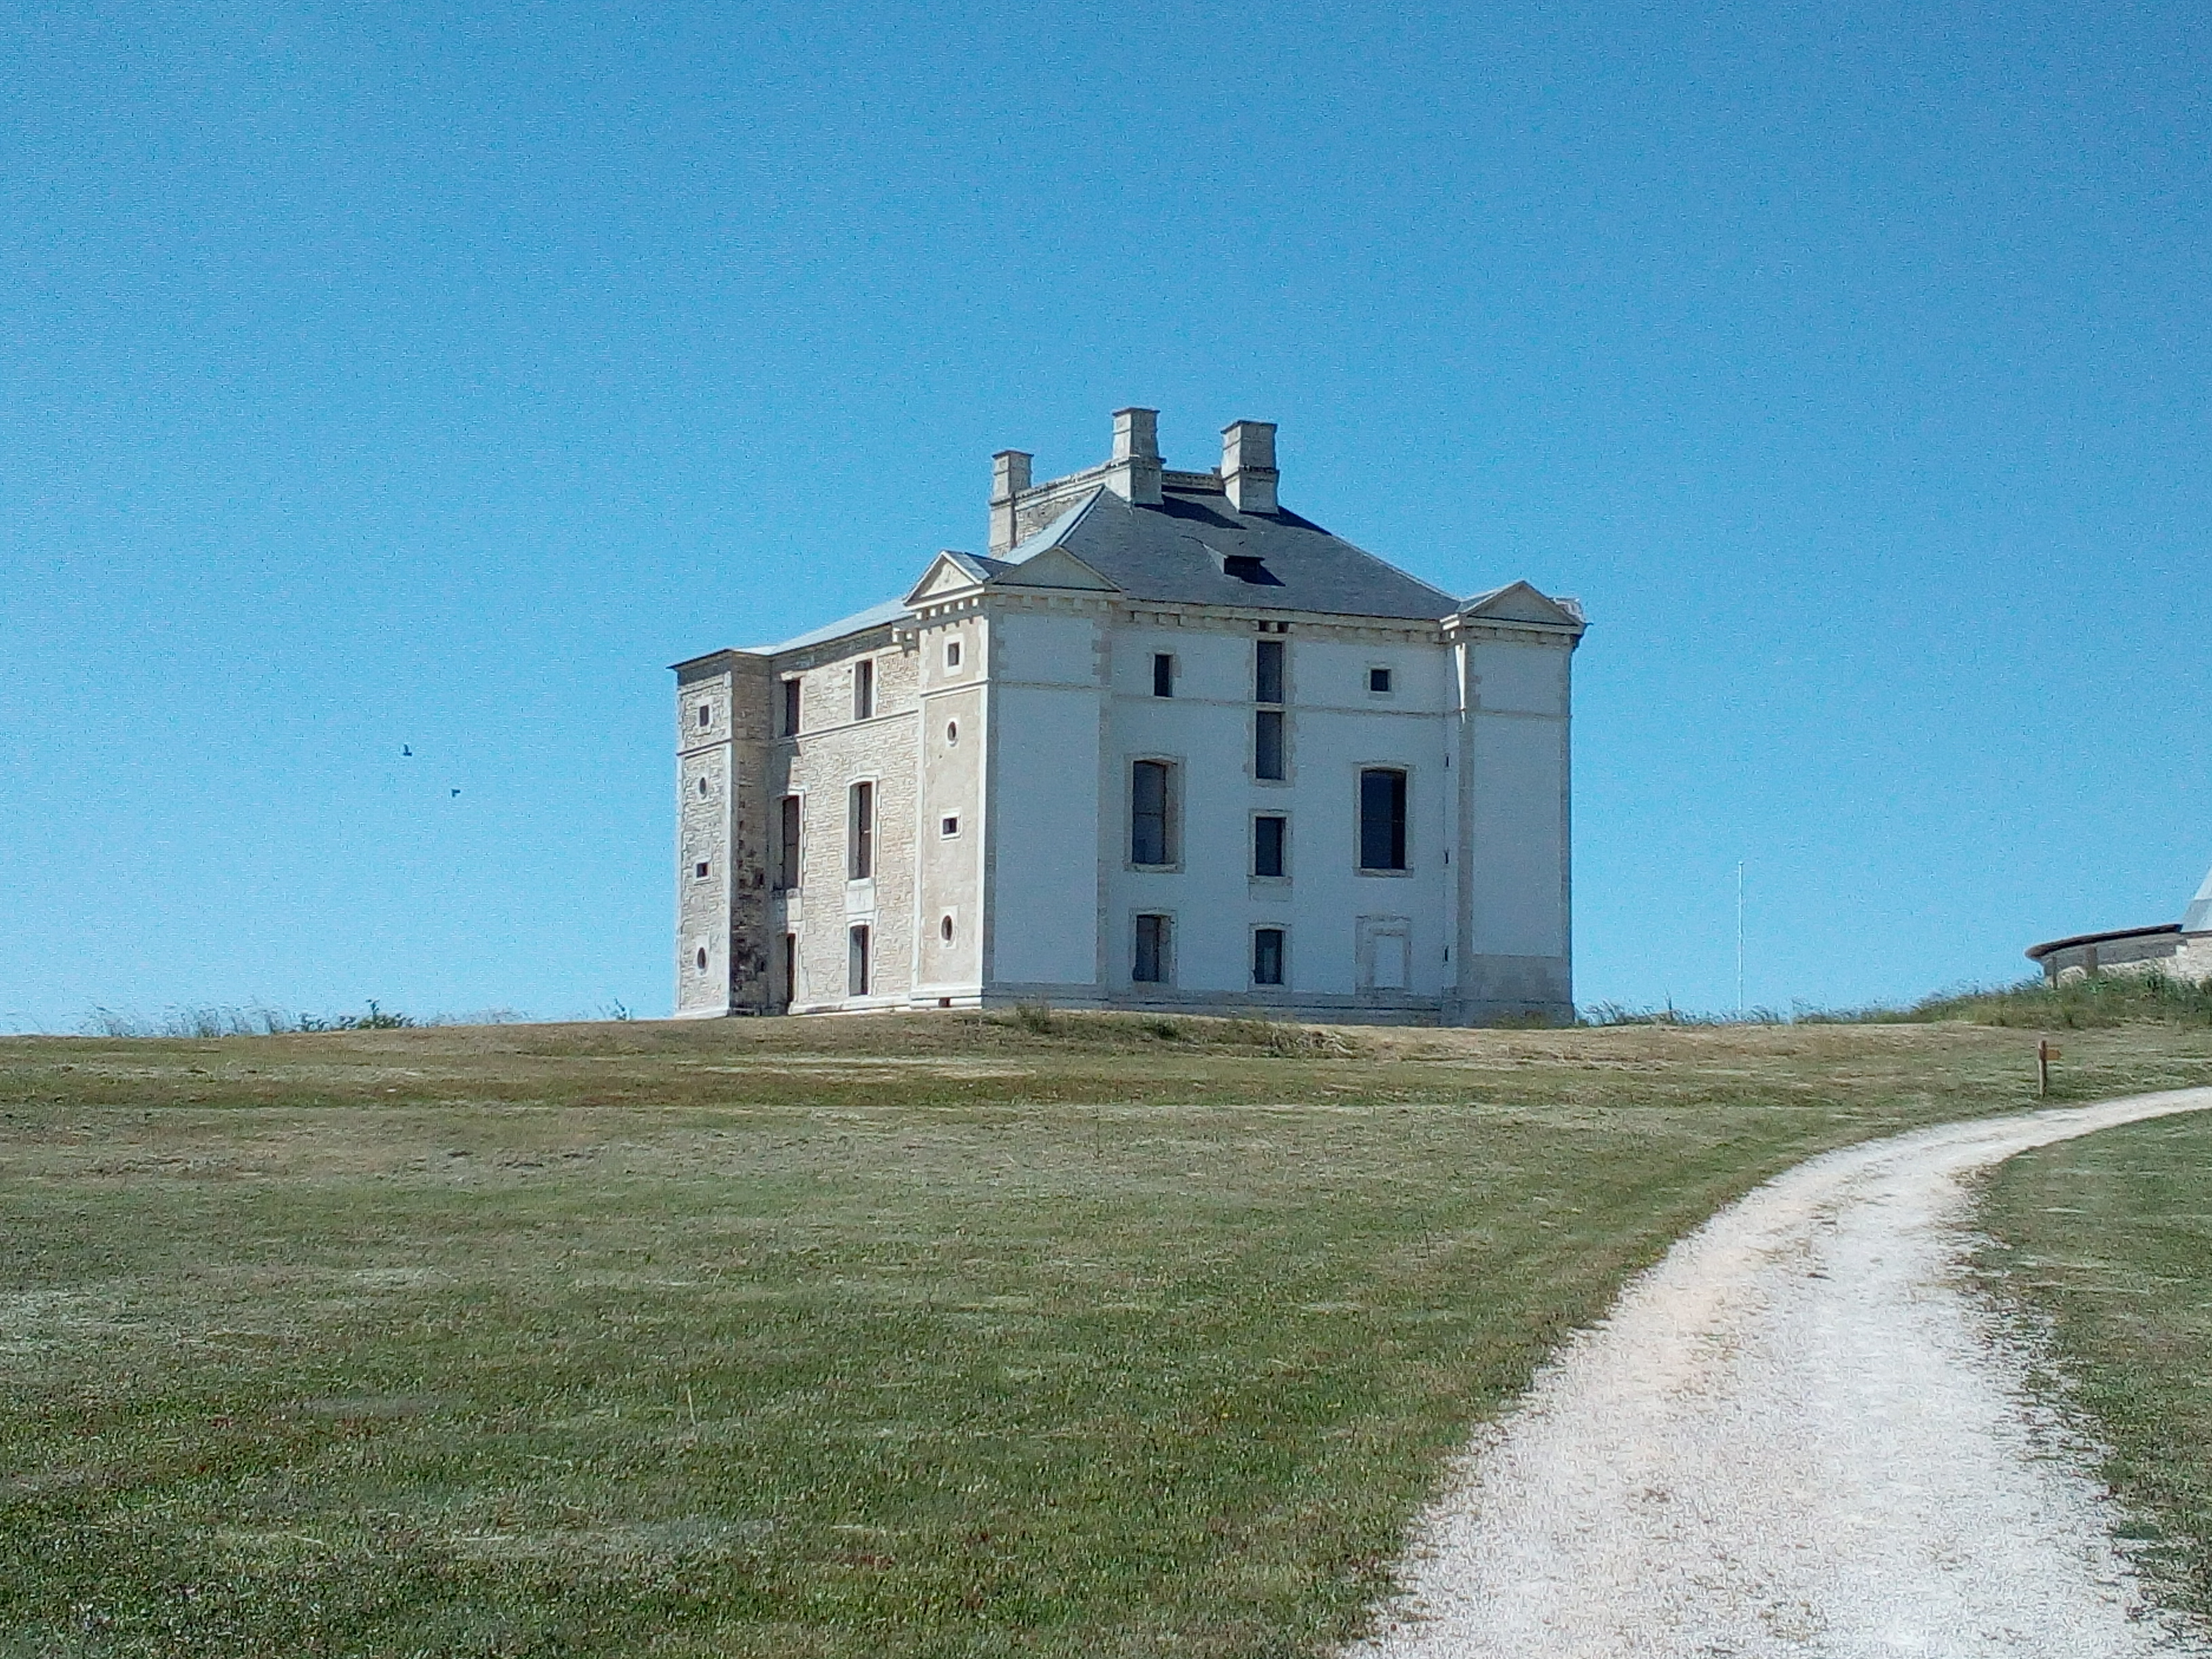 Château de Maulnes à Cruzy-le-Châtel (89)